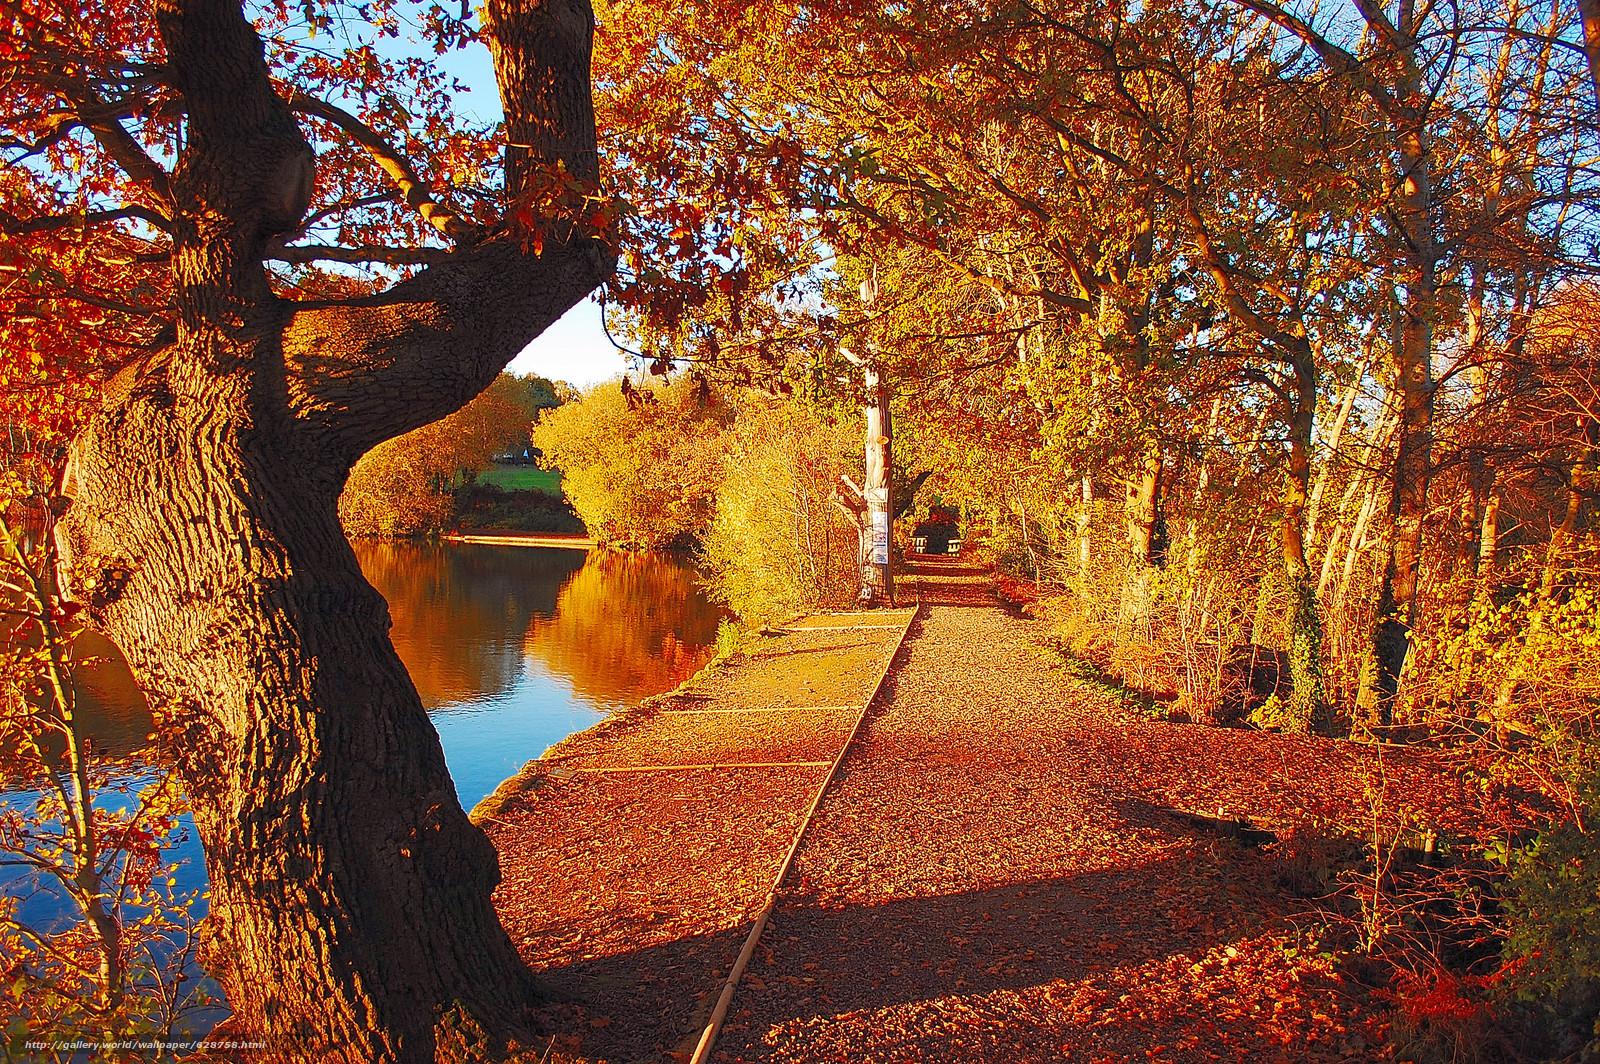 осень, пруд, деревья, парк, дорога, пейзаж